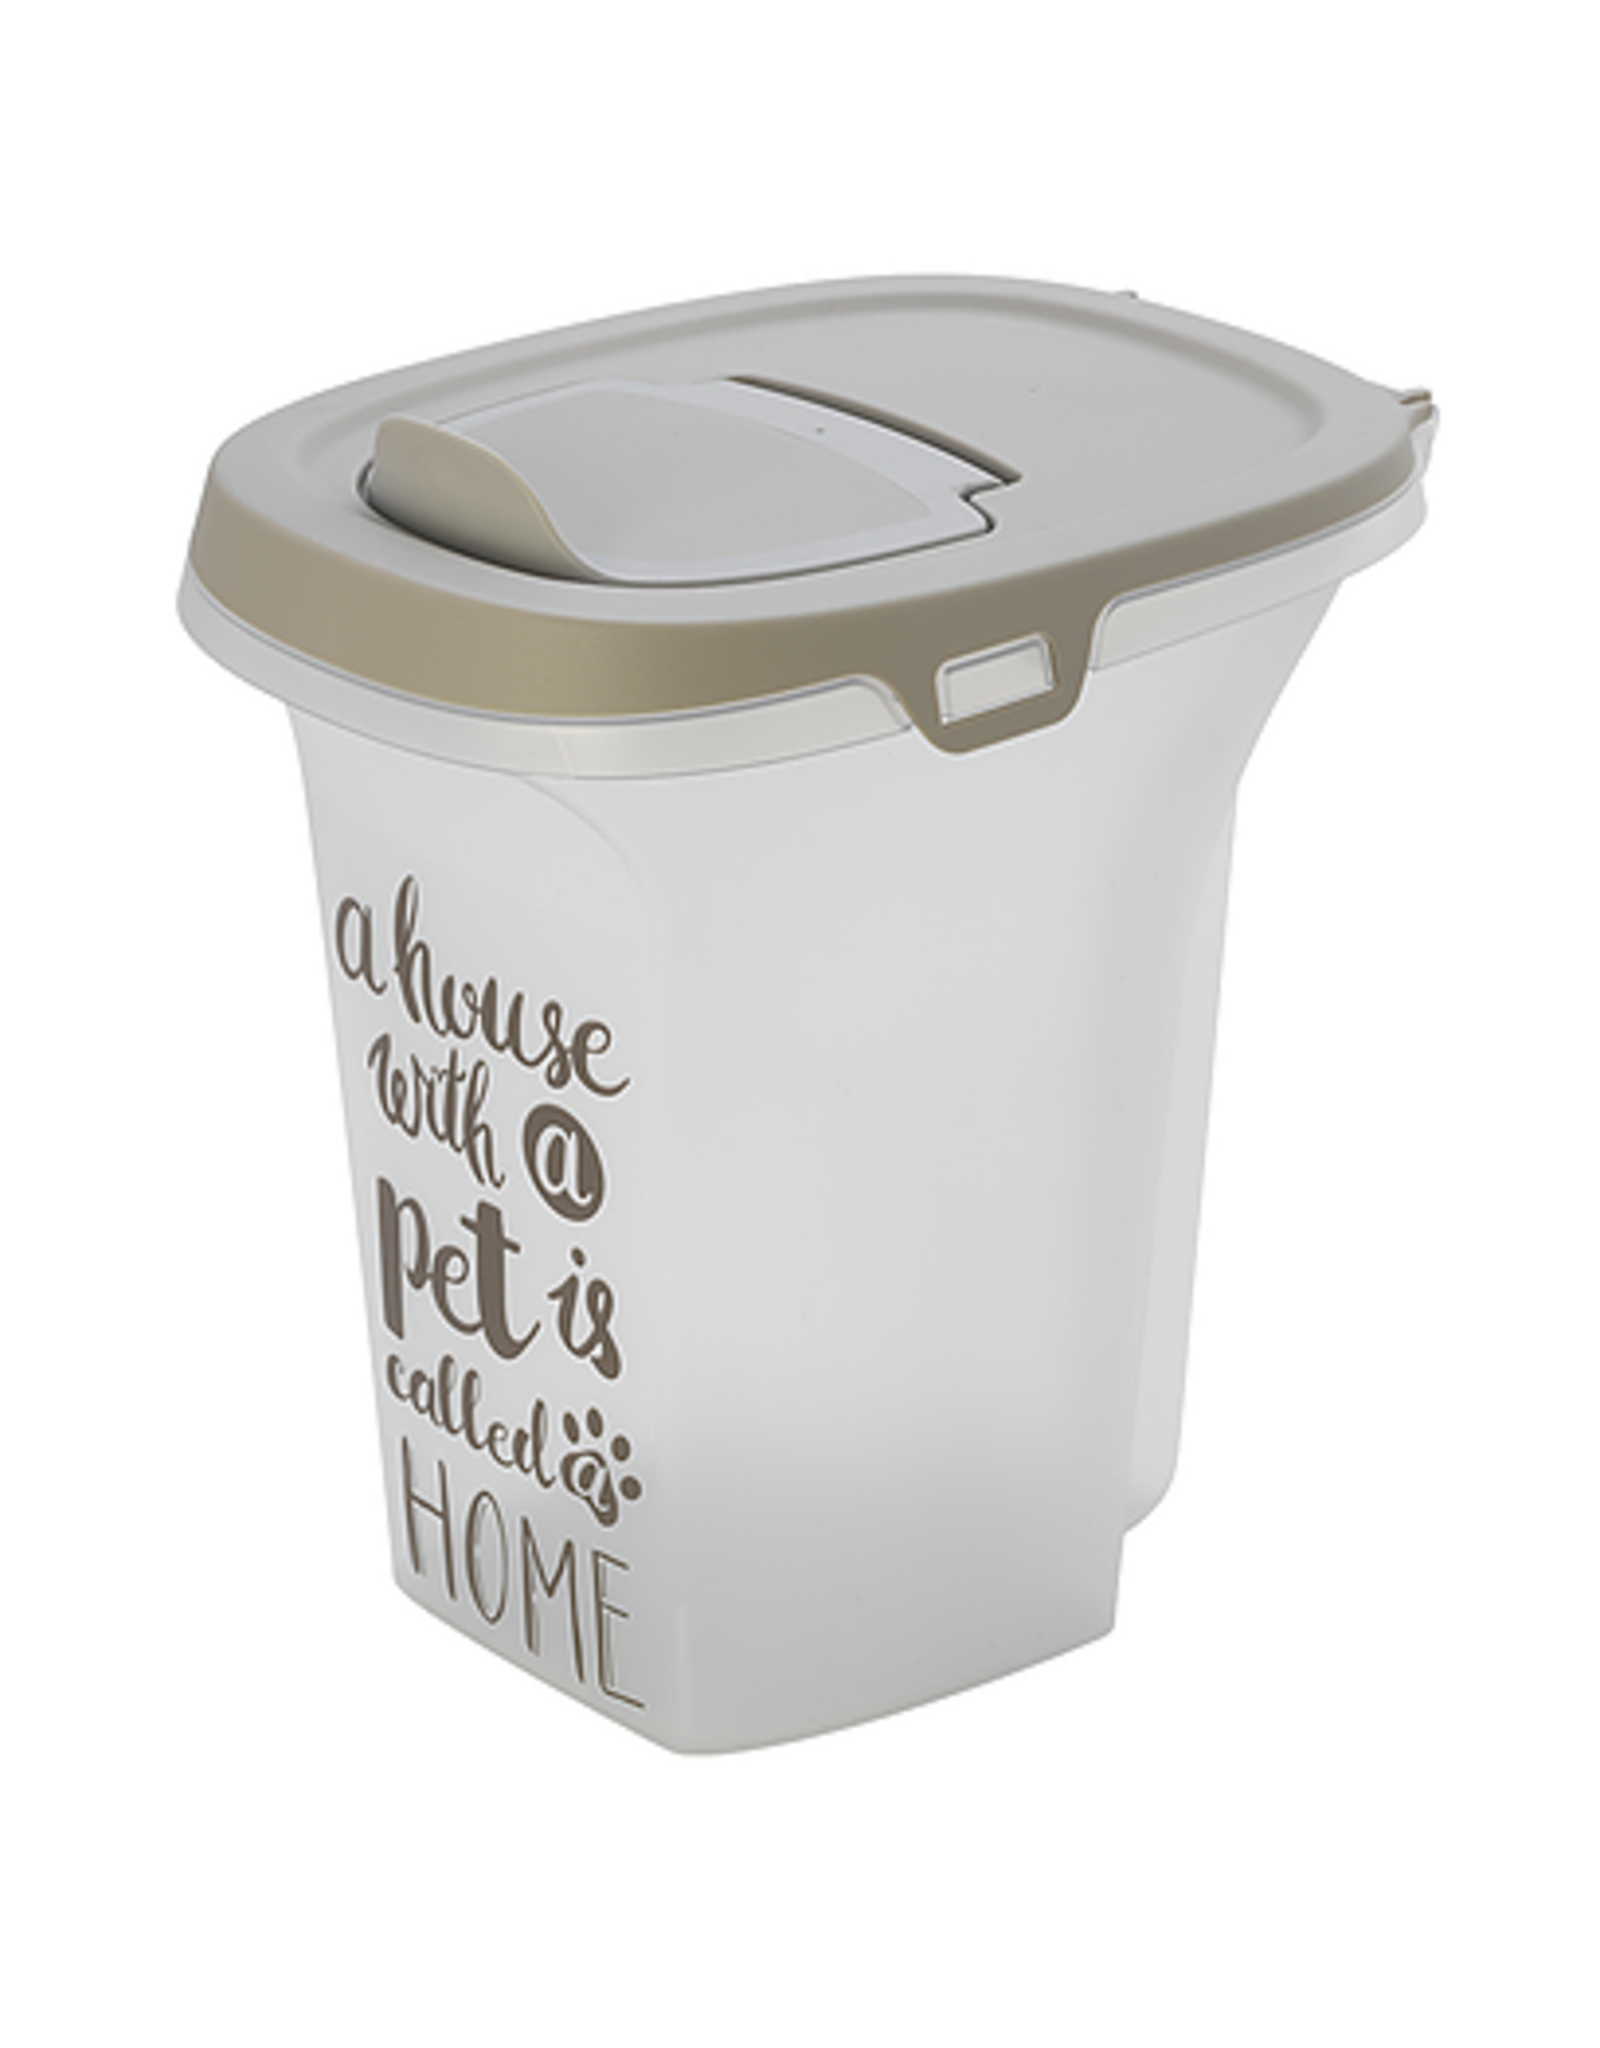 Moderna Moderna Trendy Pet Wisdom Storage 25 cup